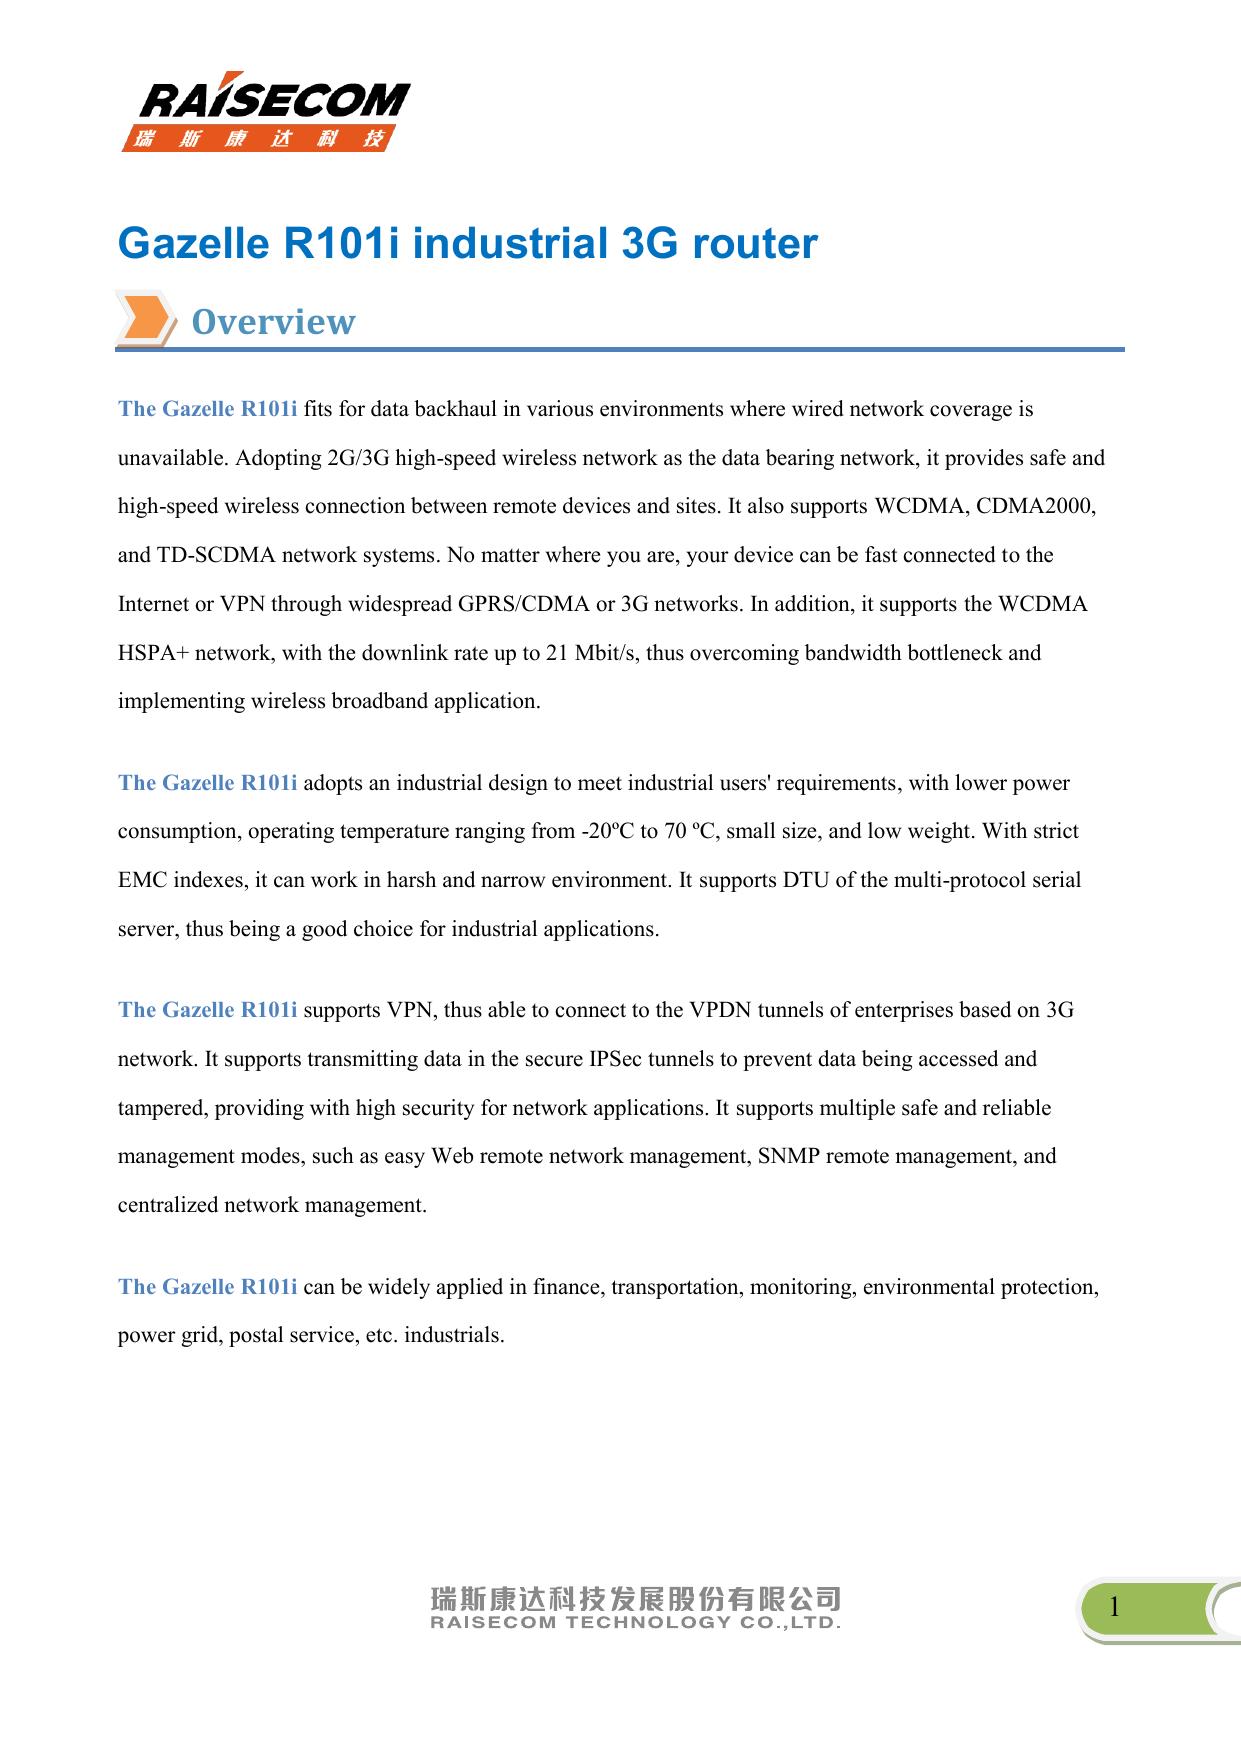 Gazelle R101i industrial 3G router | manualzz com